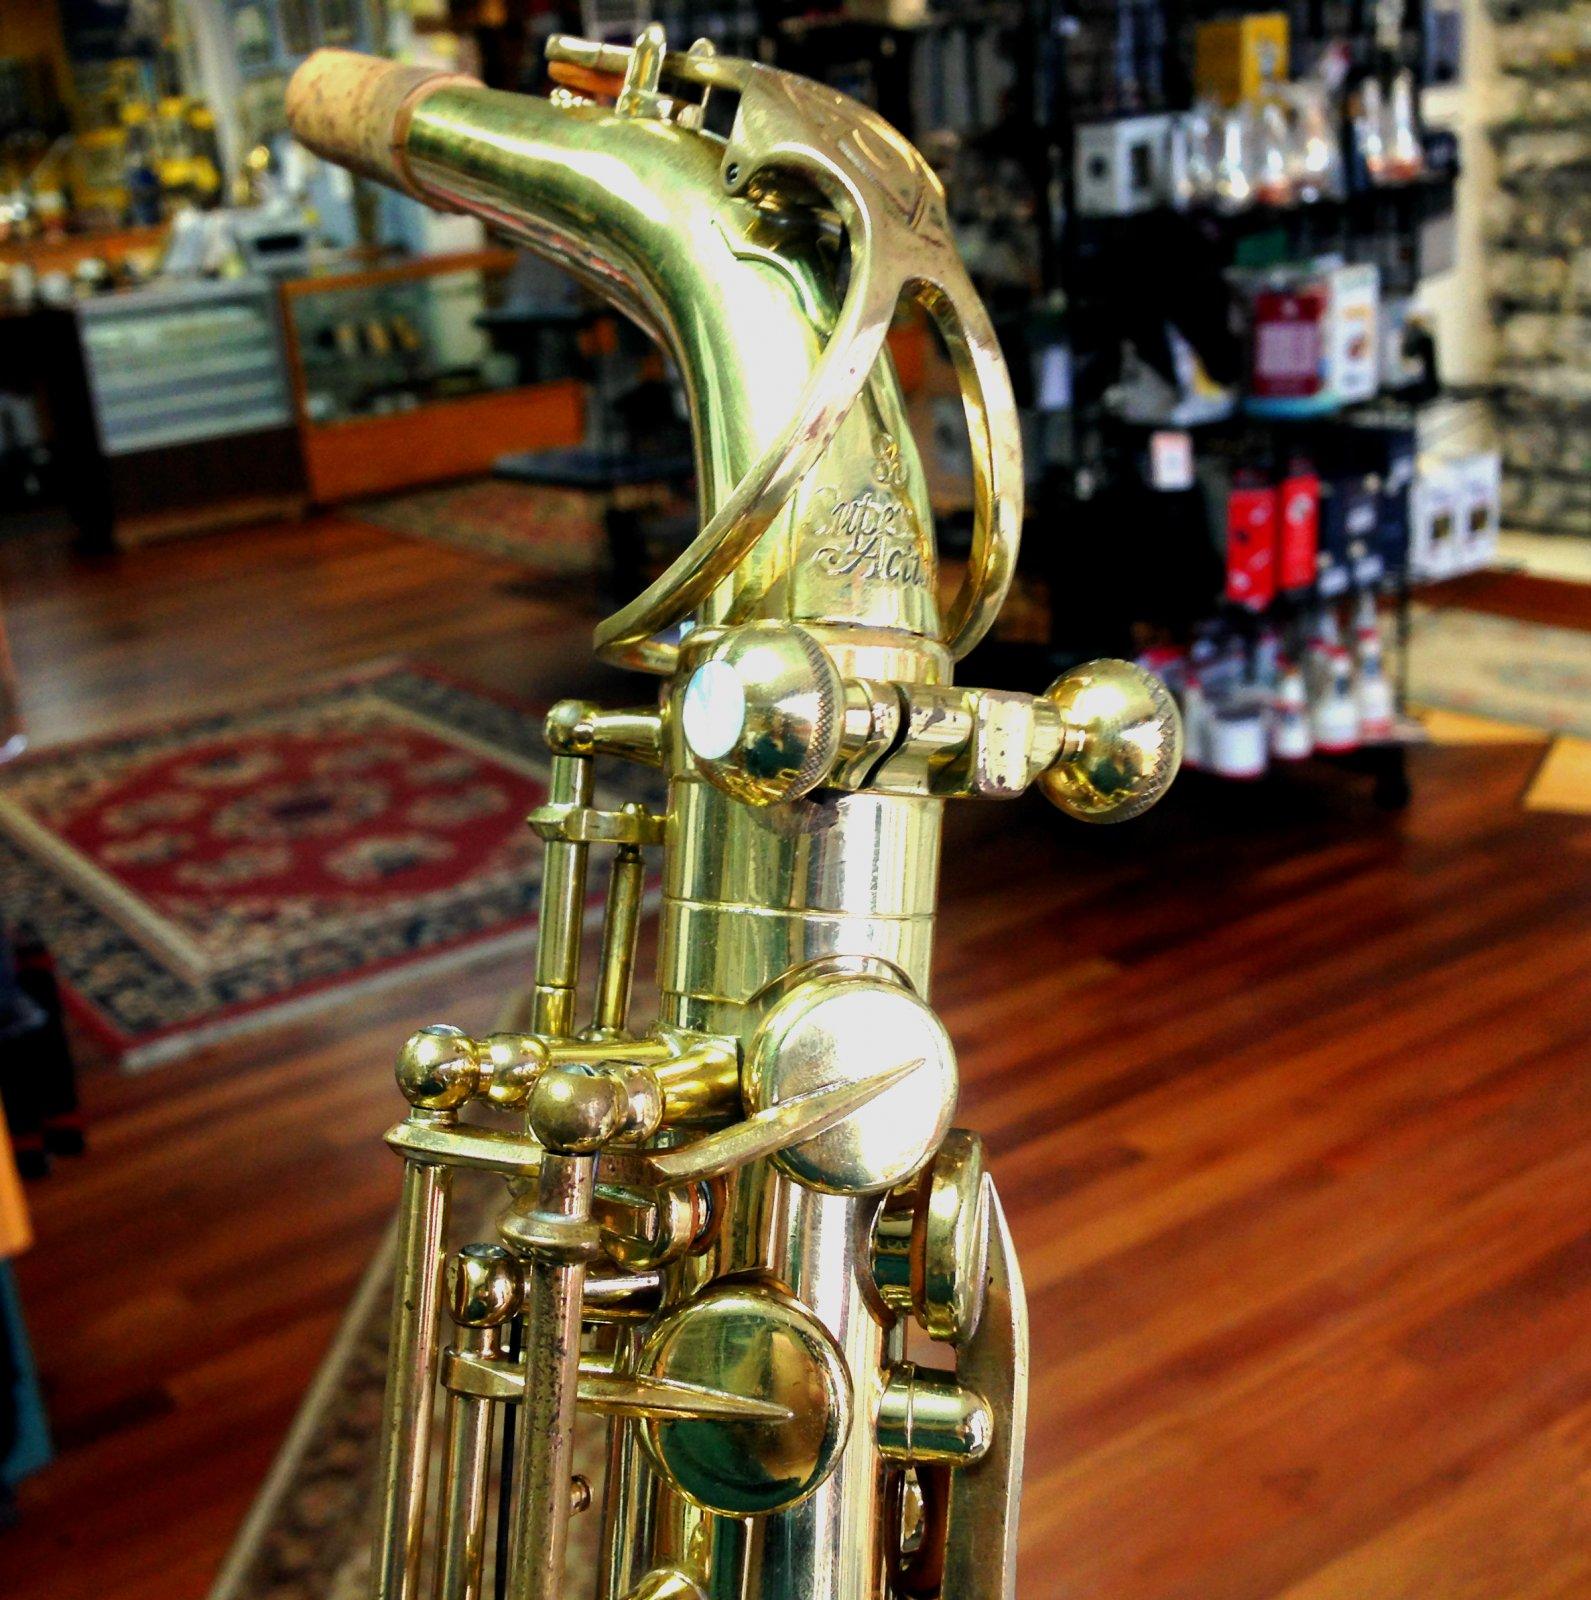 Ergonomic Heavy Mass Neck Screws for Selmer or Yanagisawa Saxophones